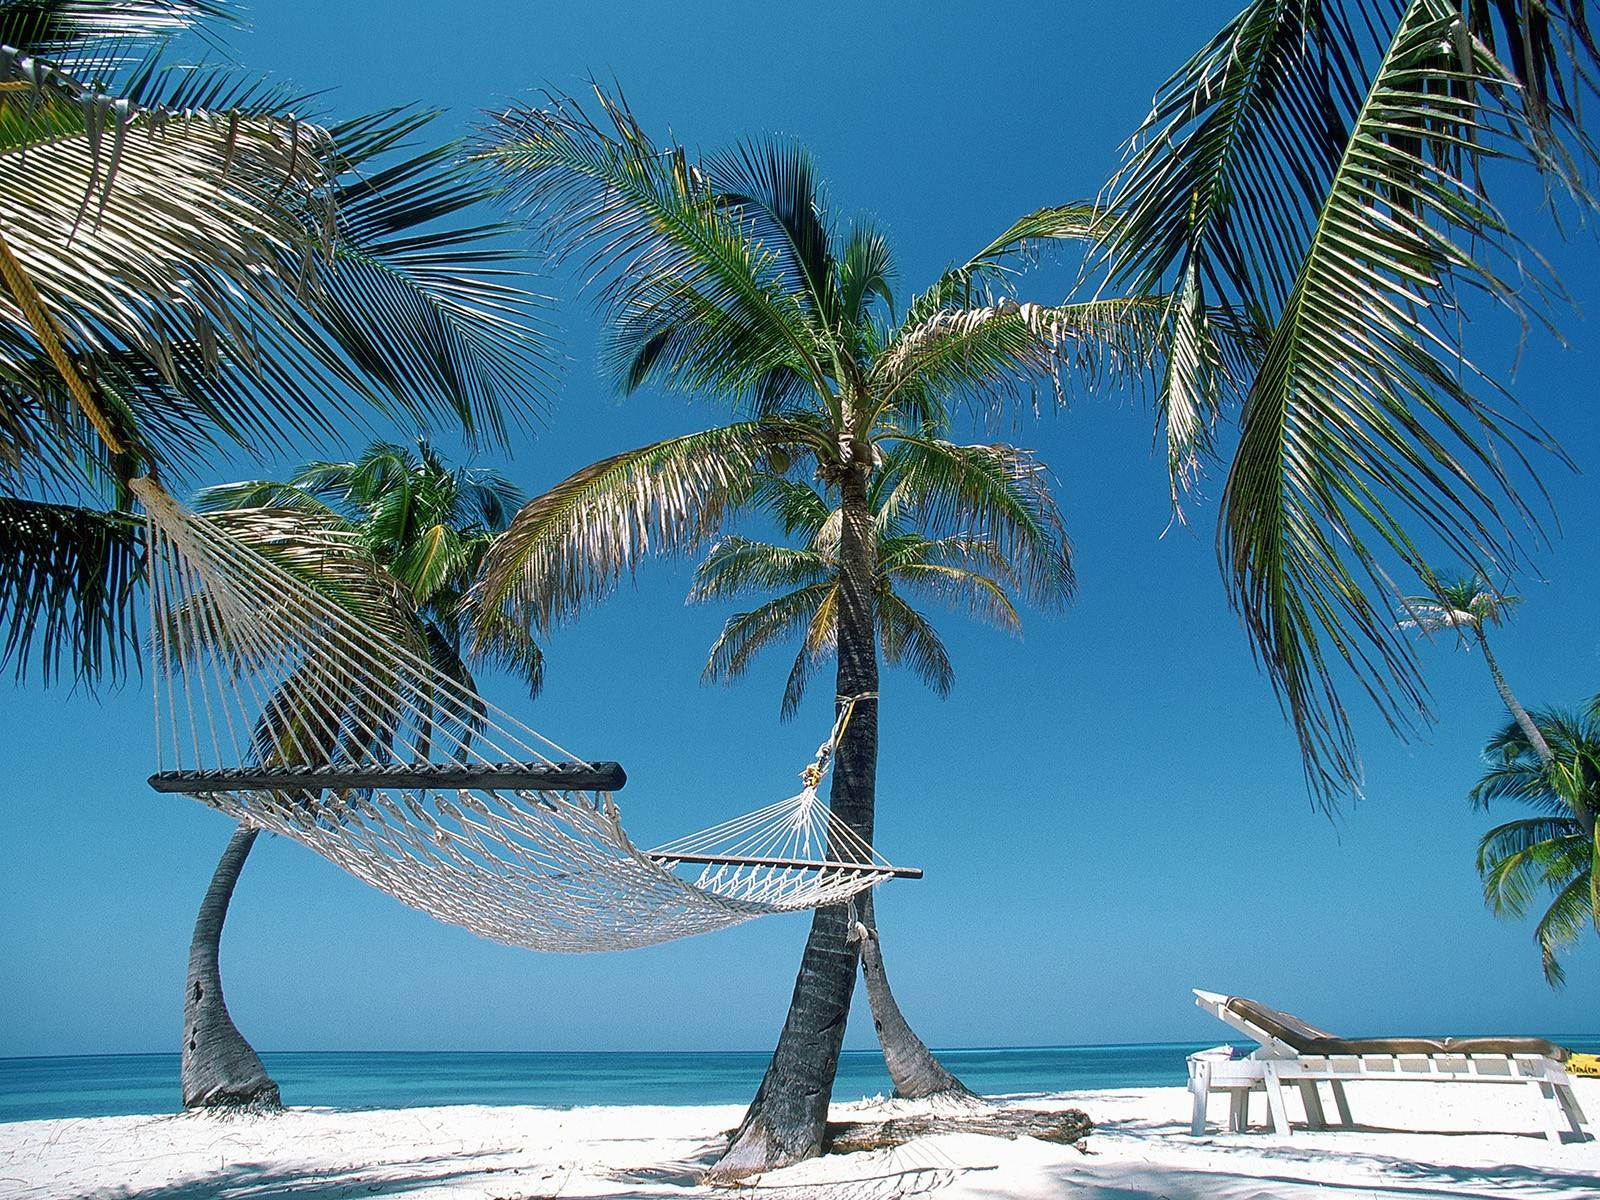 Beach Hammock 16001200 Wallpaper 2385332 1600x1200